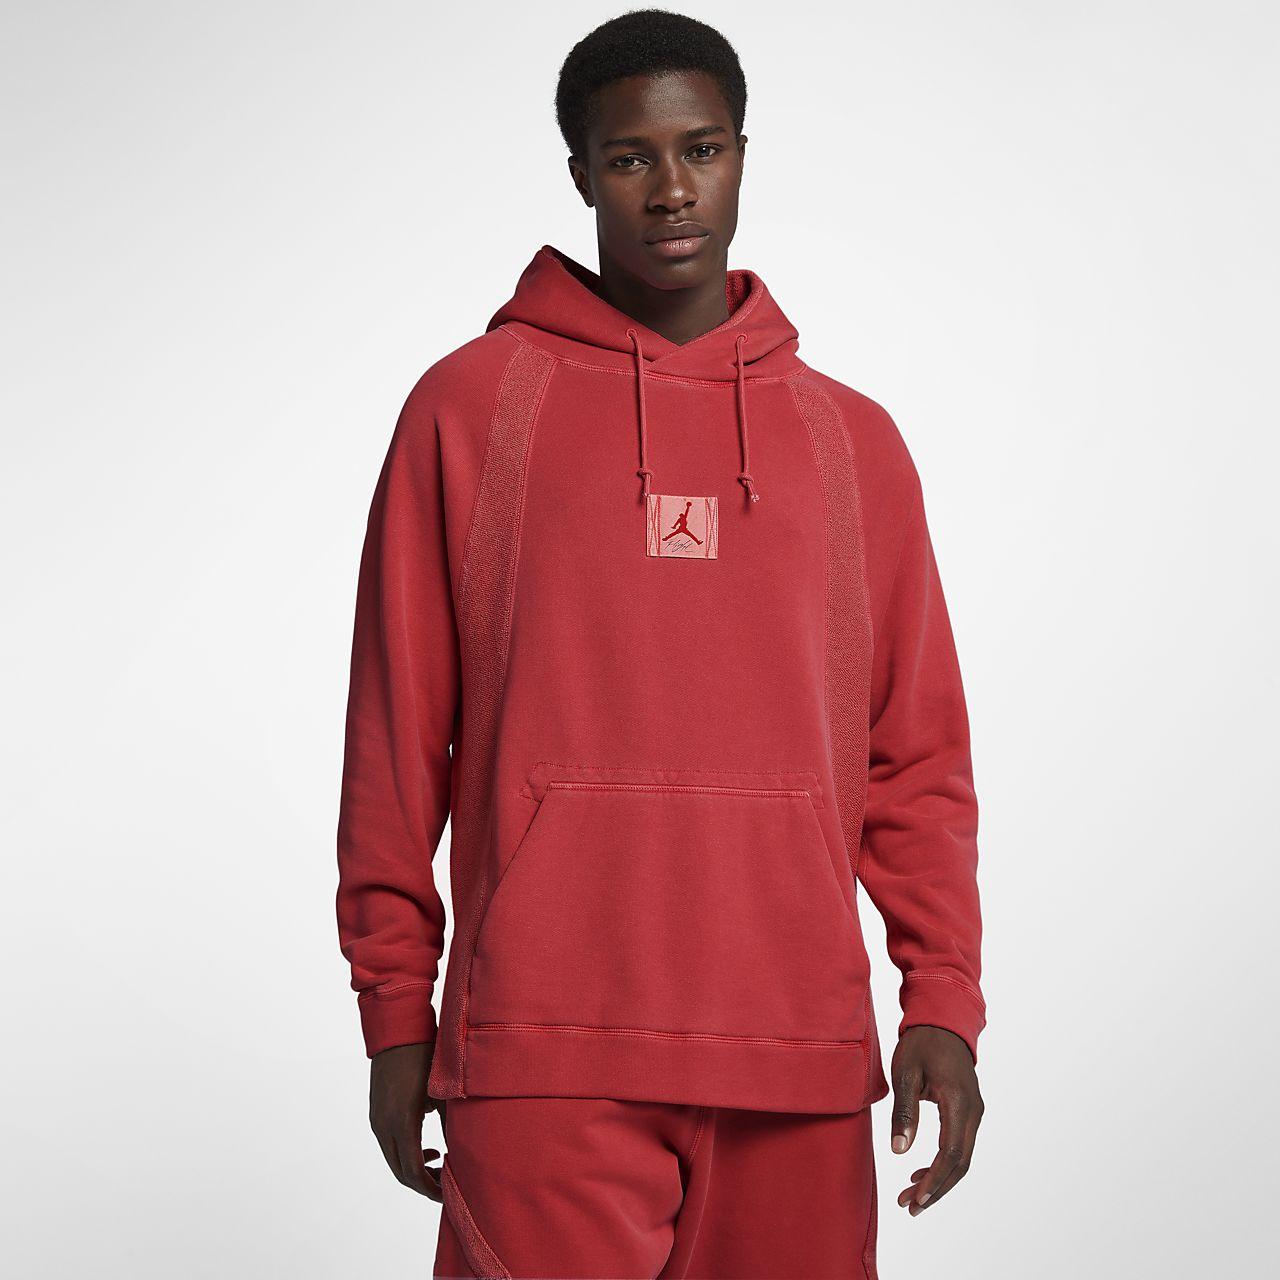 Vintage Red Wings Sweatshirt - Cotswold Hire b625b6005